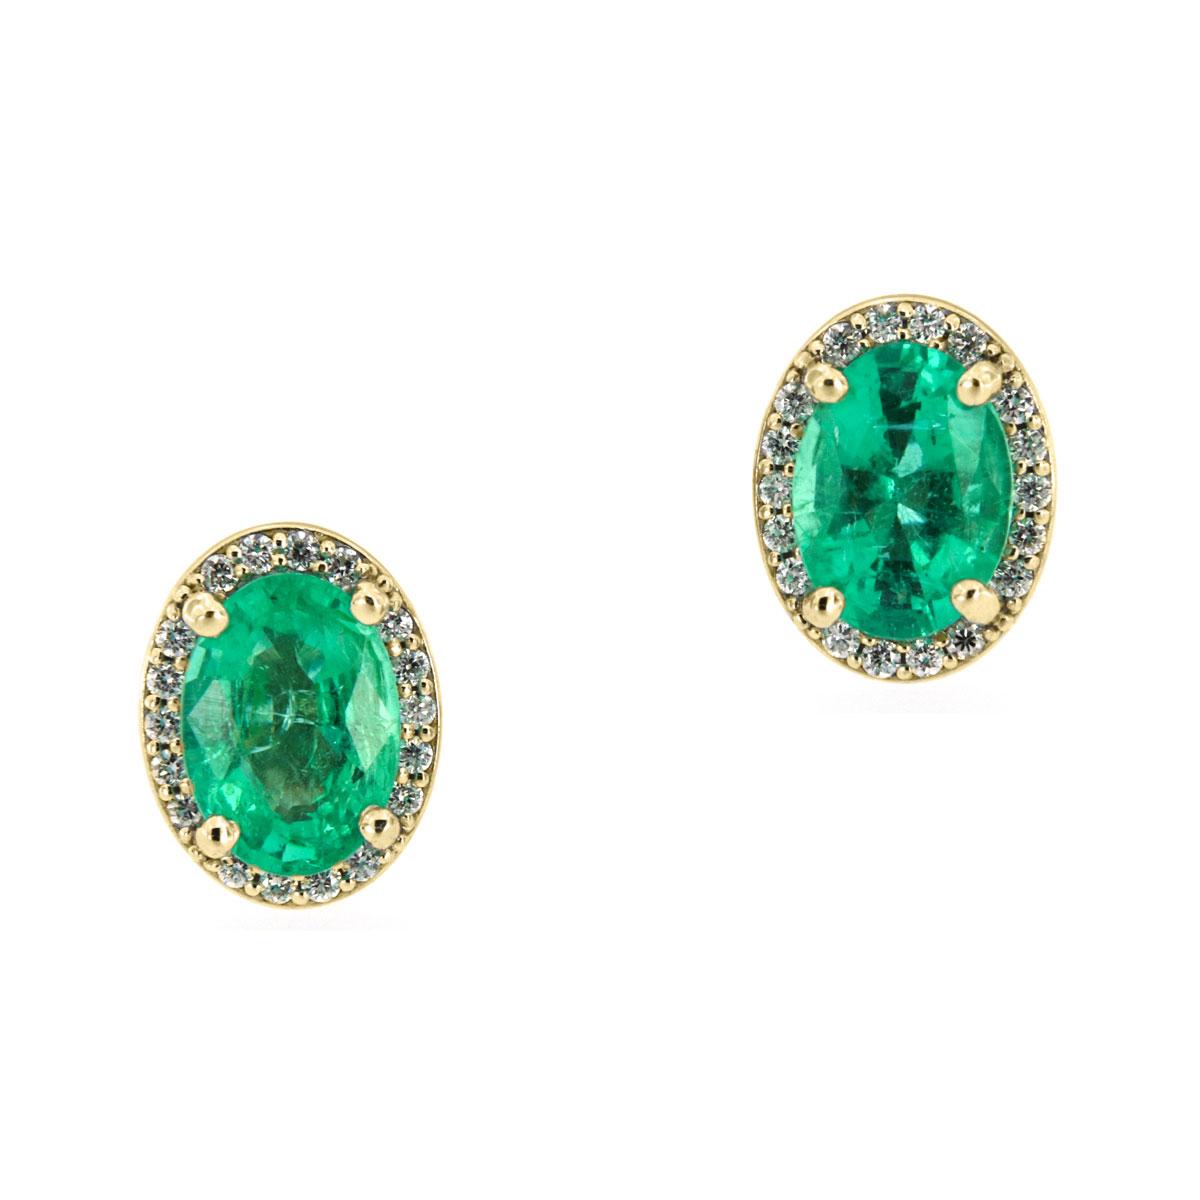 14K Yellow Gold Halo Diamonds & Emeralds Earrings ( 1 1/2 ct. tw)